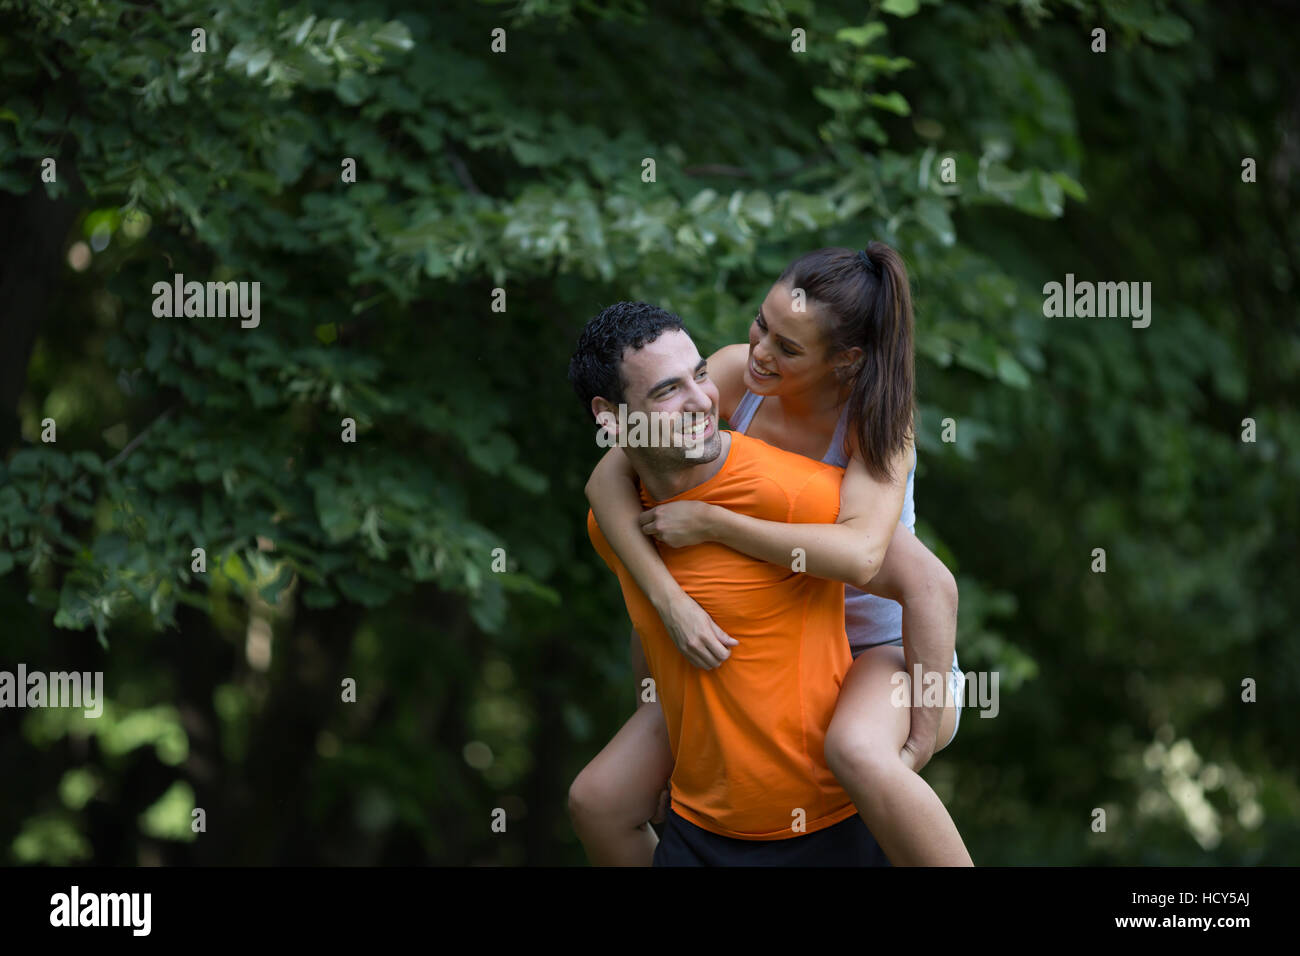 Man carrying woman he loves piggyback - Stock Image